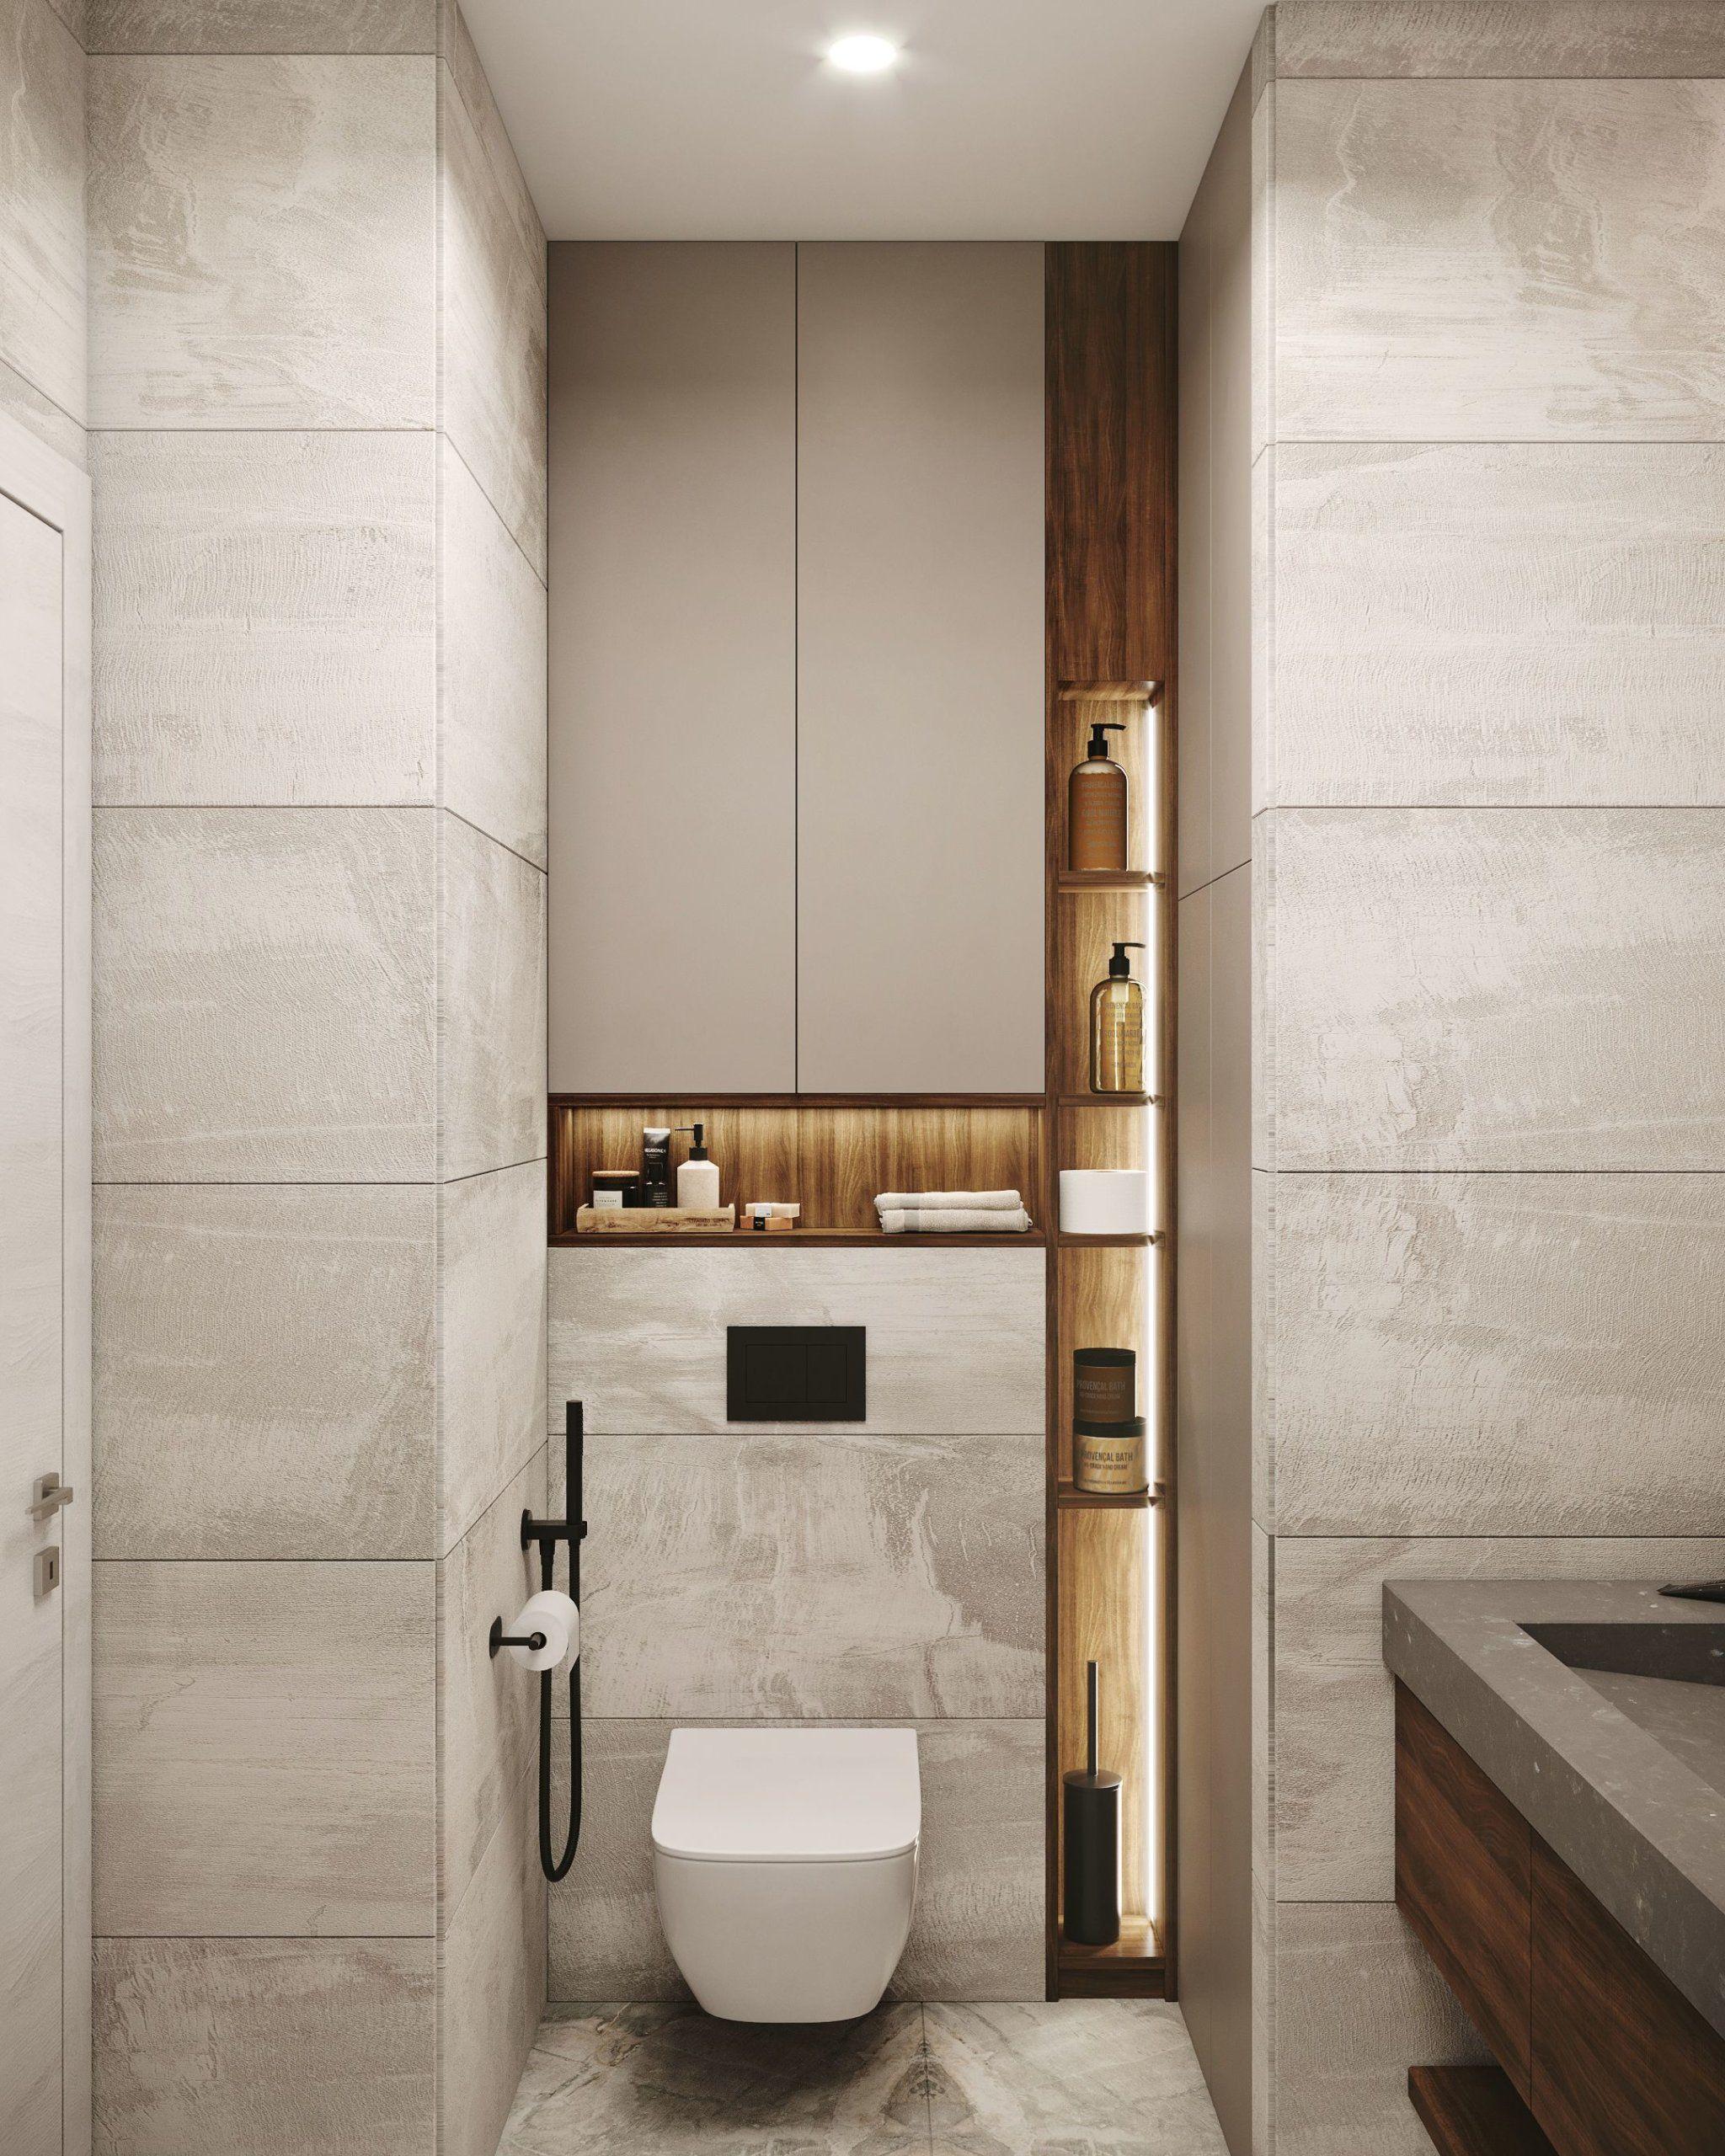 30 Stunning Bright Bathroom Design Ideas